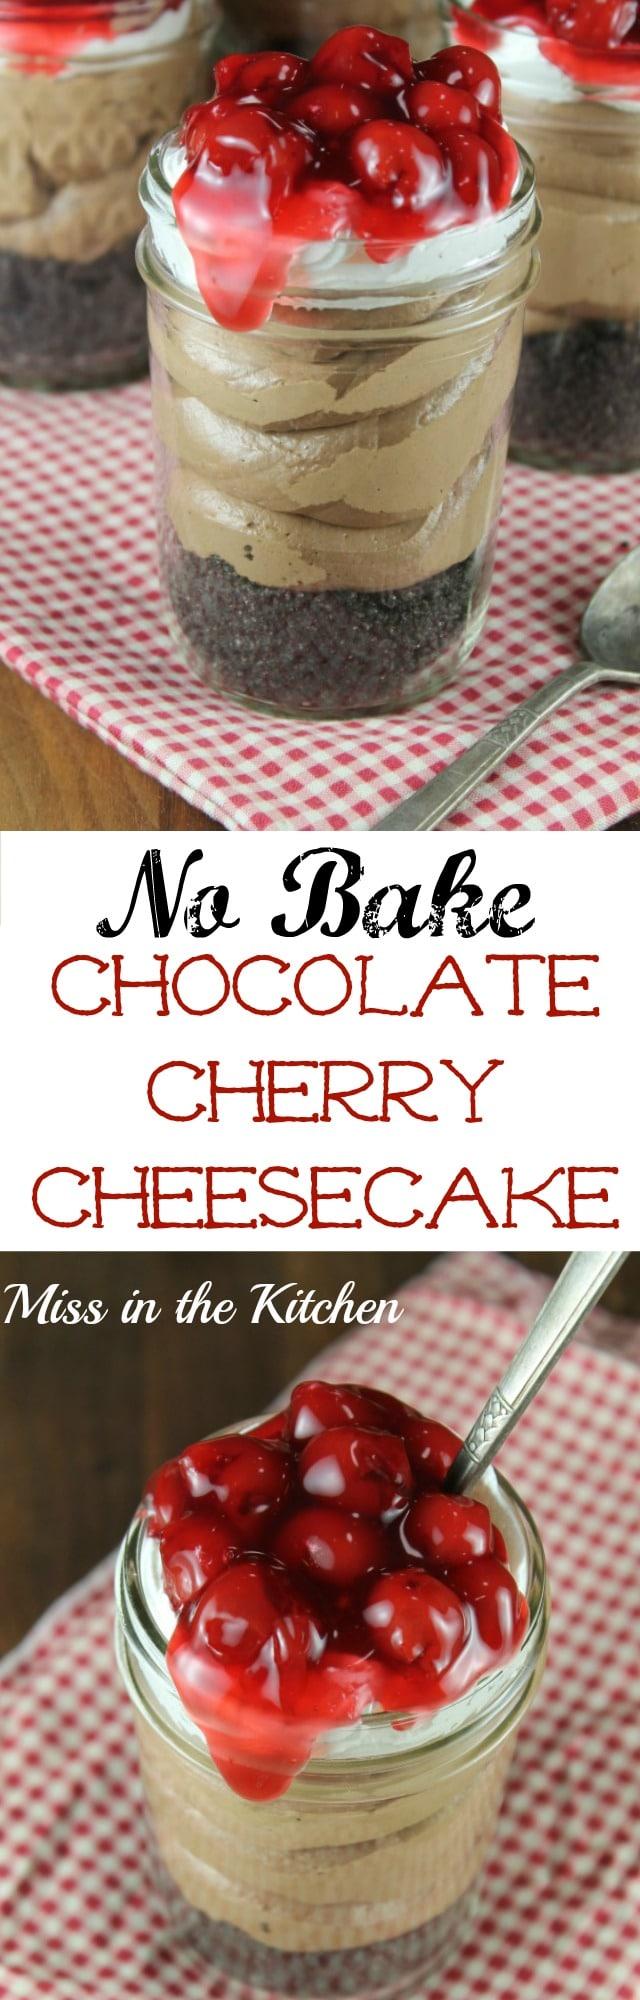 No Bake Chocolate Cherry Cheesecake in a Jar for Wayfair #CherrySweet National Cherry Month.  Recipe found at MissintheKitchen.com #Sponsored